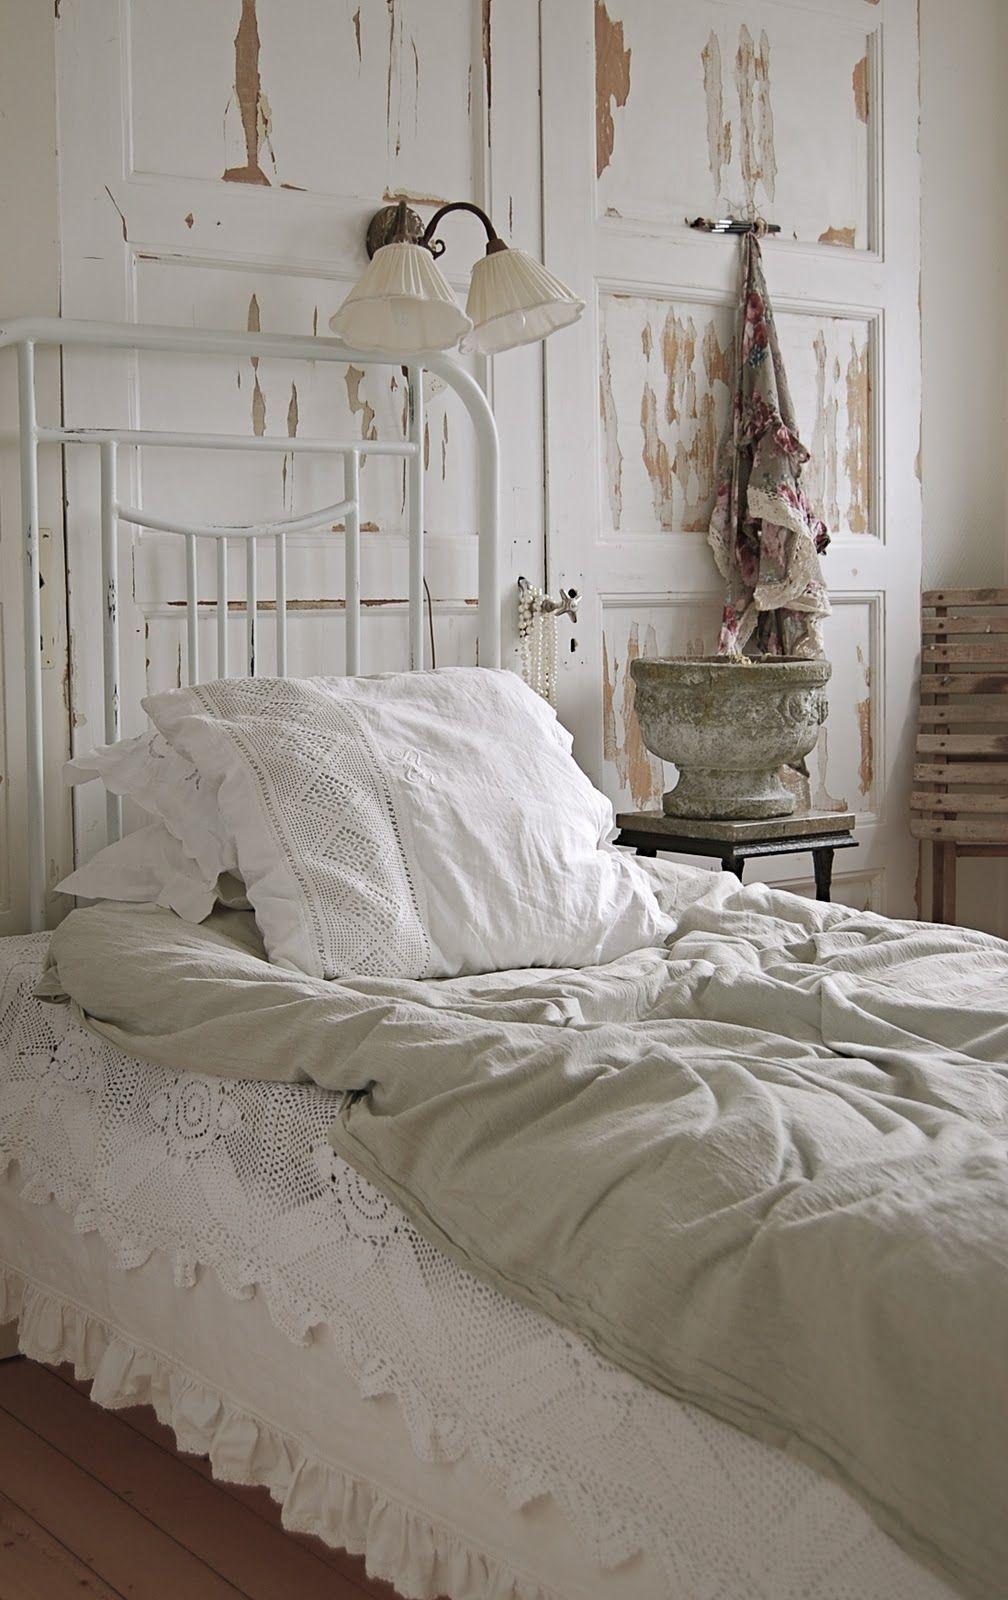 16 Old Doors Used As Dramatic Headboard Decoholic Shabby Chic Bedrooms Chic Bedroom Shabby Chic Homes